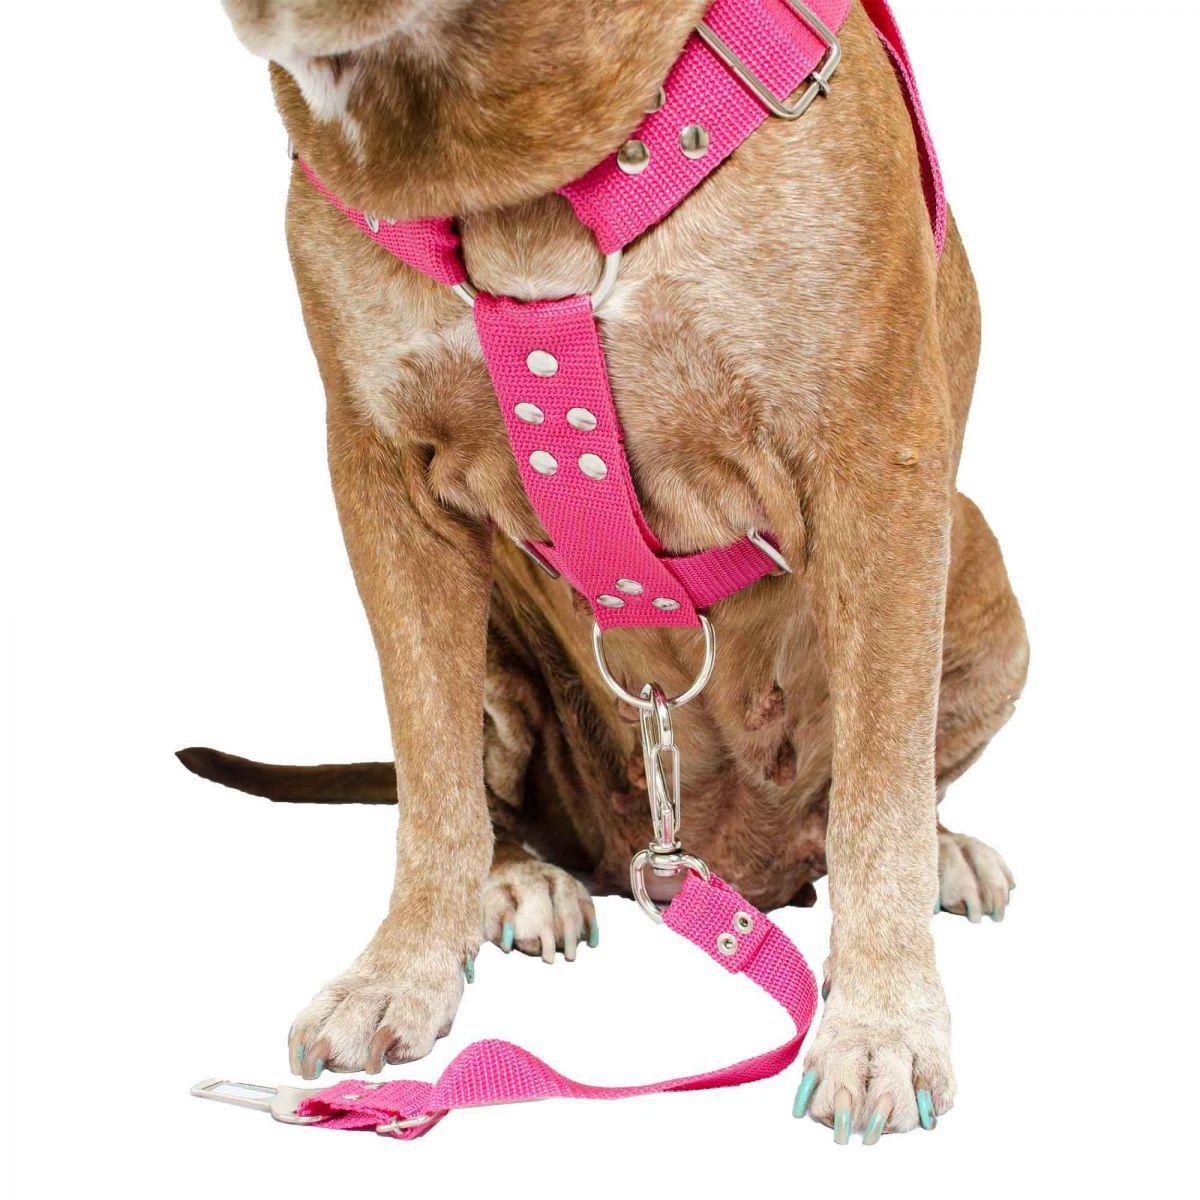 Kit 2x Coleira Peitoral Guia Cinto Segurança Cachorro Doberman Pitbull Anti Puxao - G Vermelha + Rosa